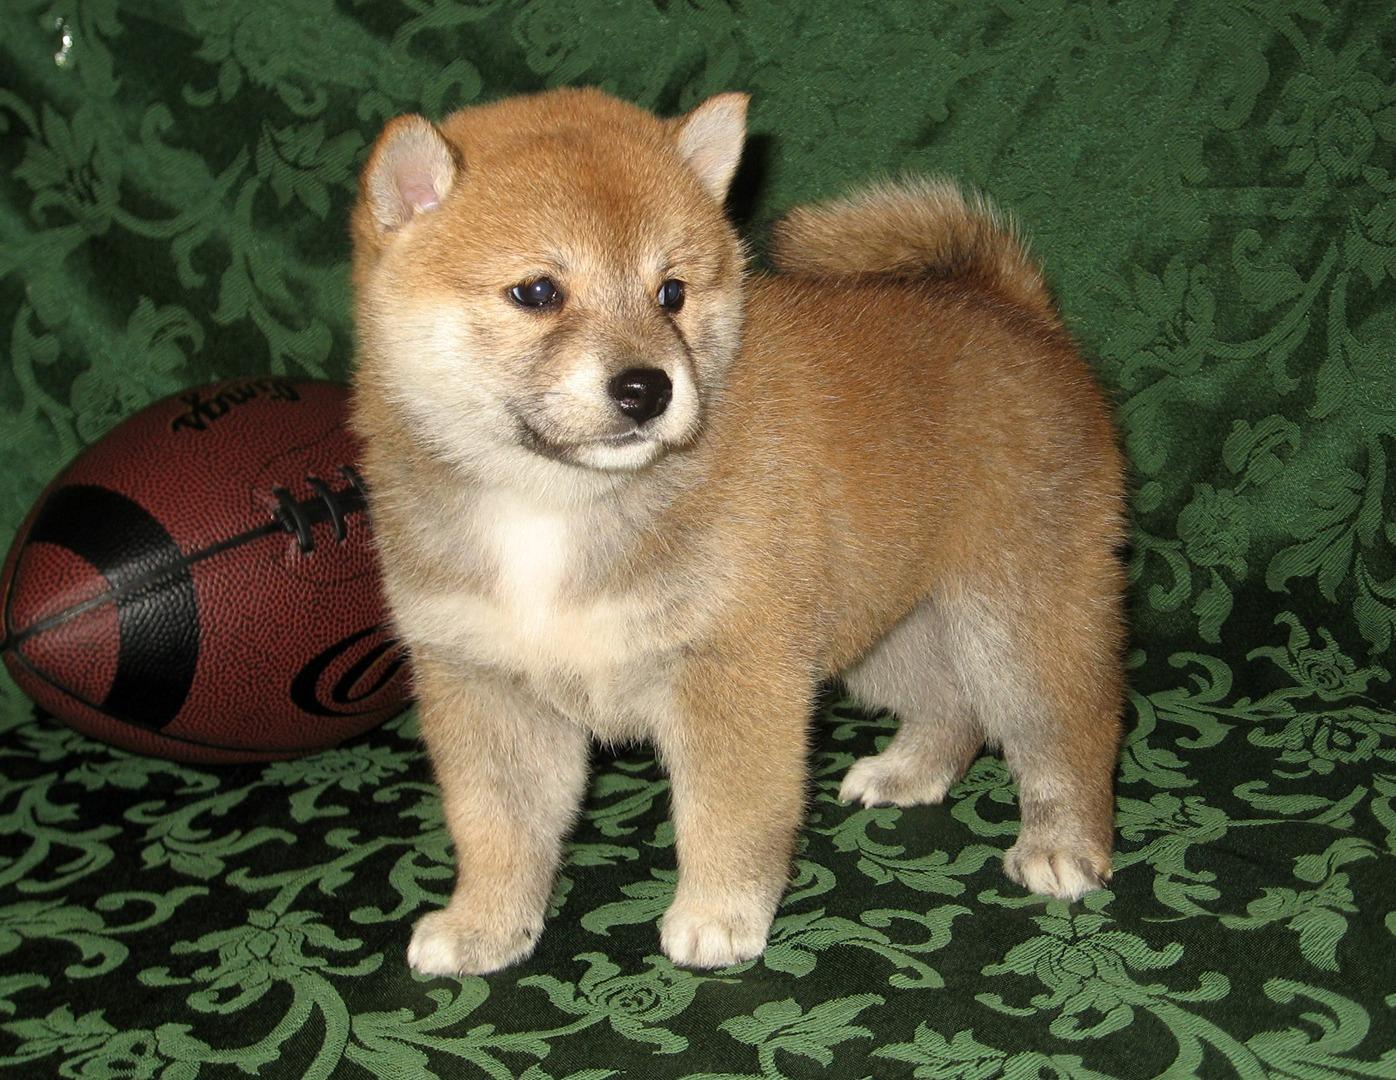 Purebred Shiba Inu puppies for sale, Shiba Inu Breeder